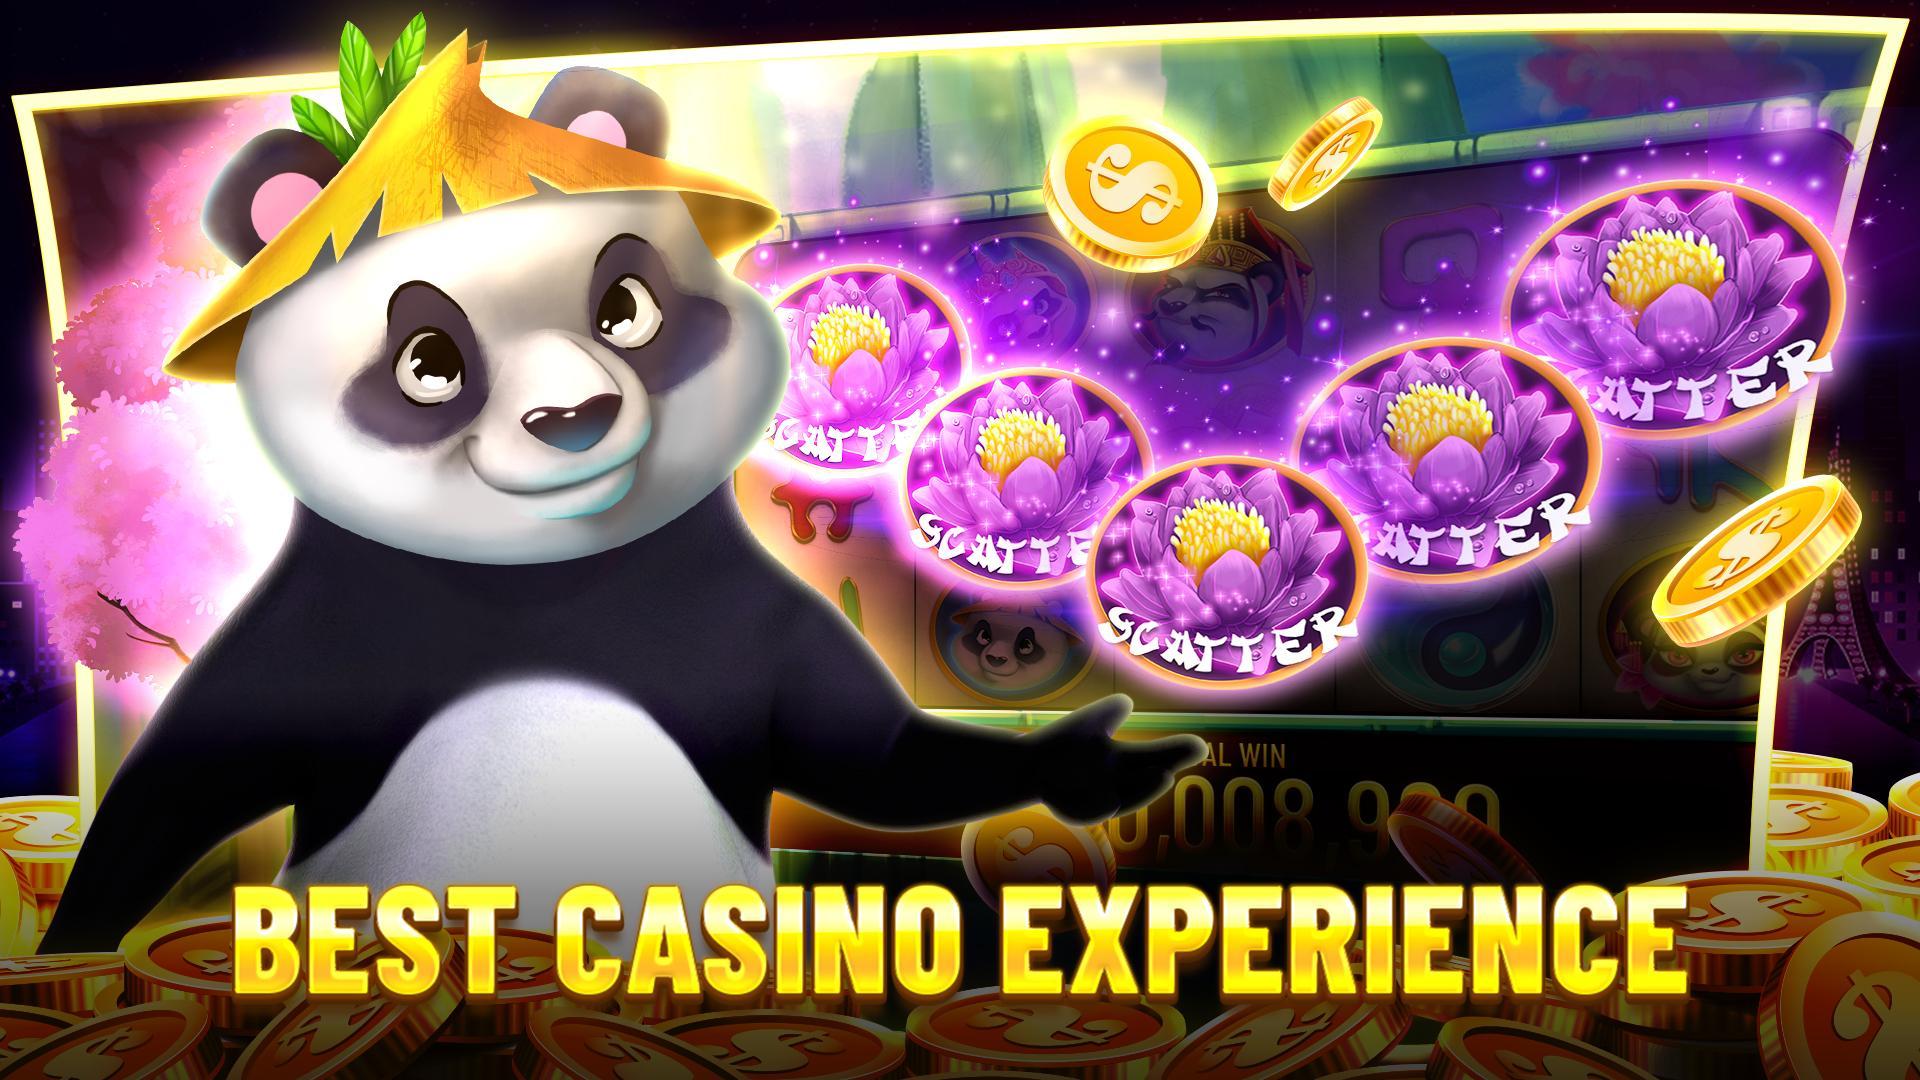 Best Casino Slots 777 Vegas Slots Games 4.5.8 Screenshot 15